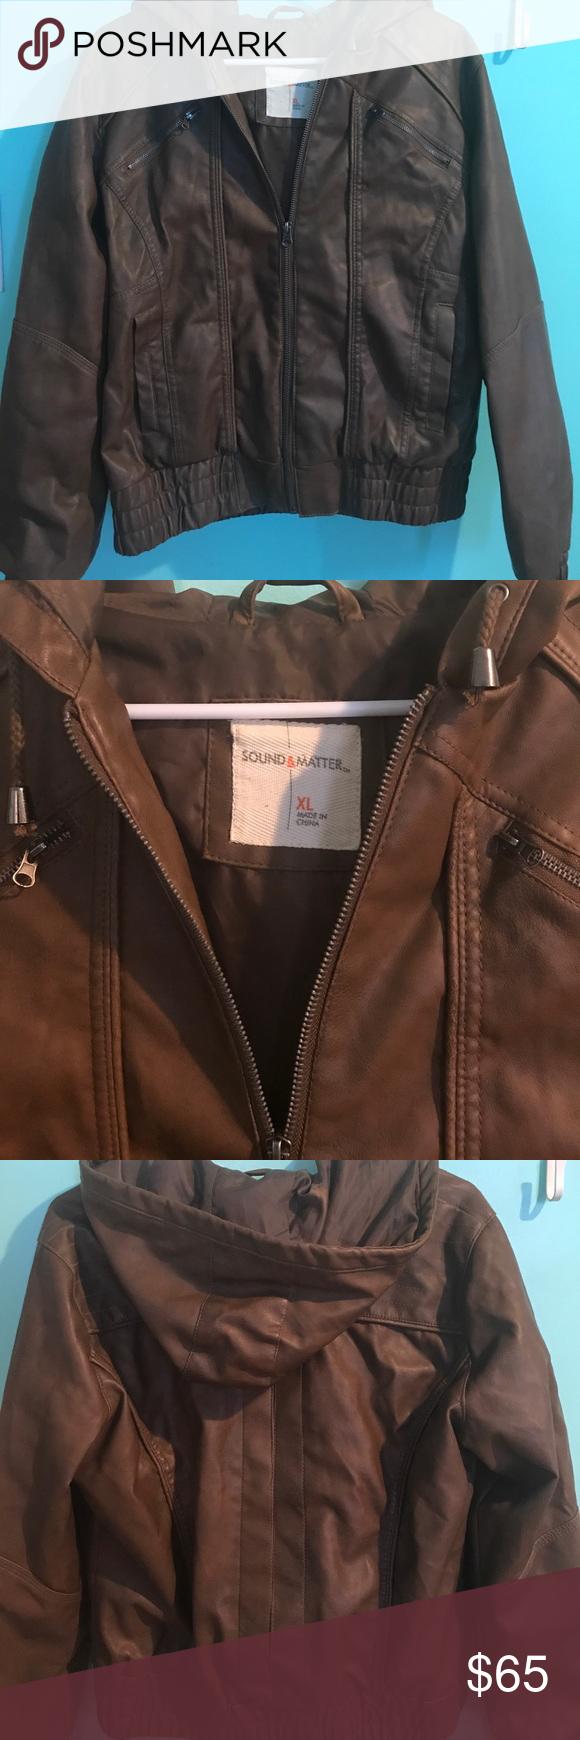 Brown Leather Jacket Leather jacket, Brown leather